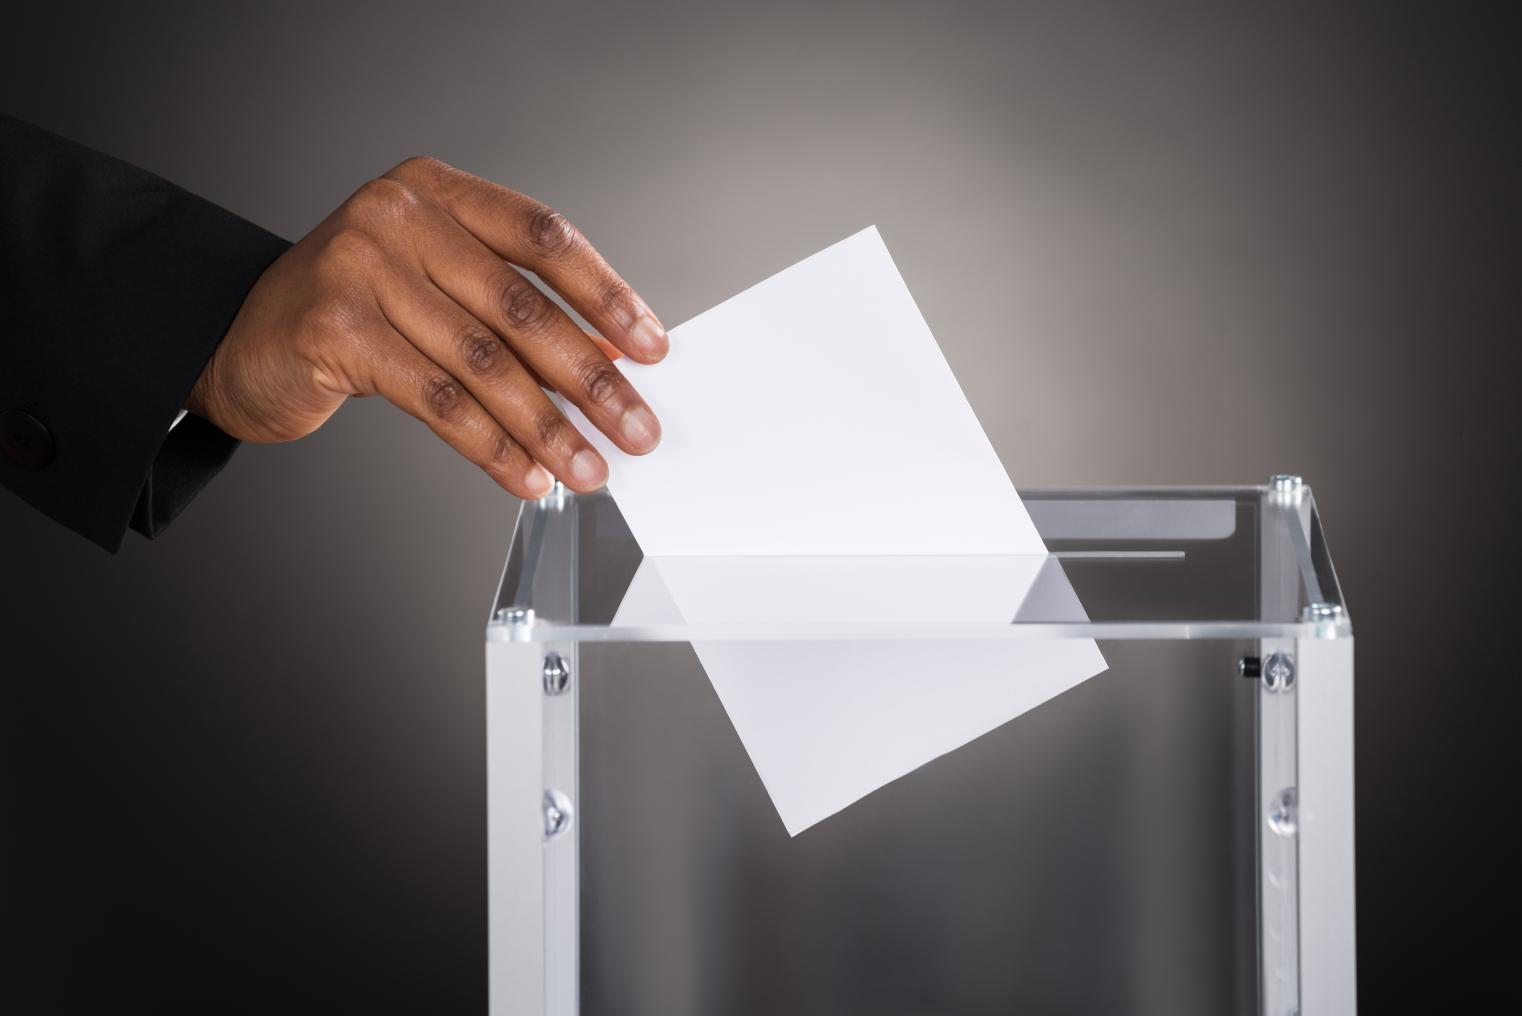 A person placing a ballot into a clear collection box.